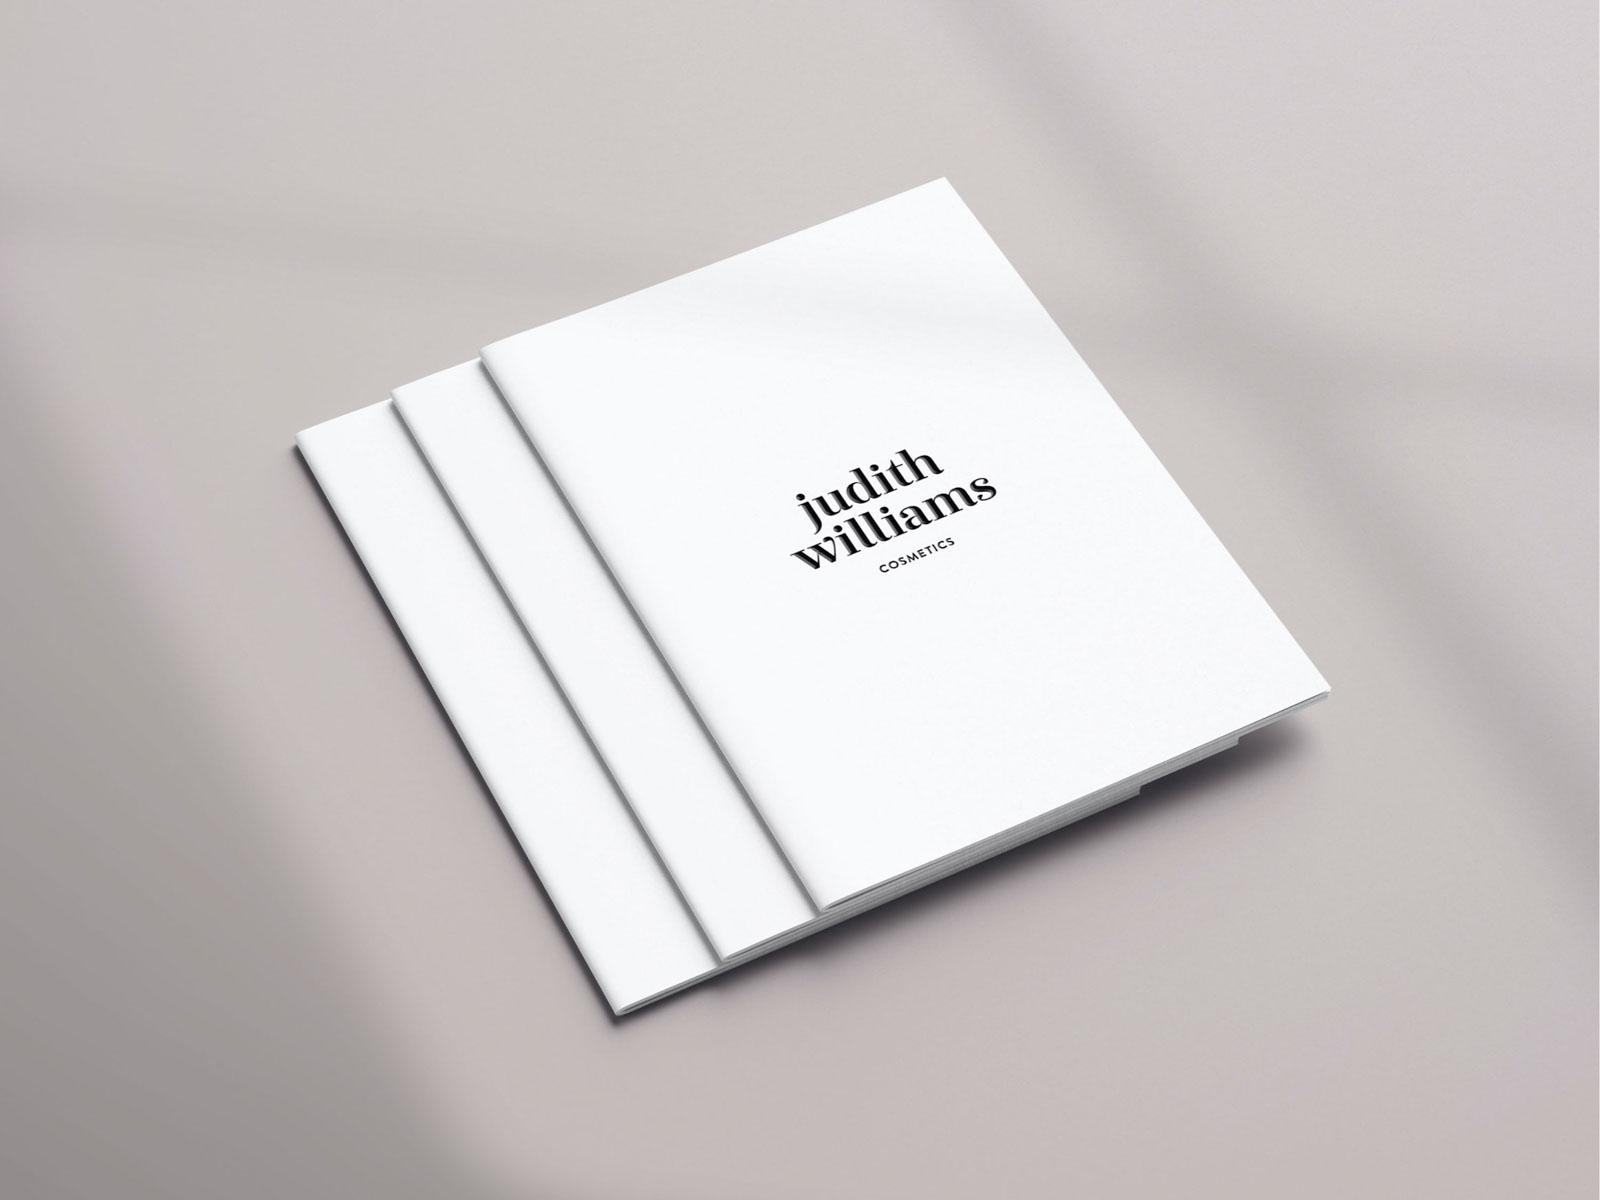 Judith Williams - Markenbooklet